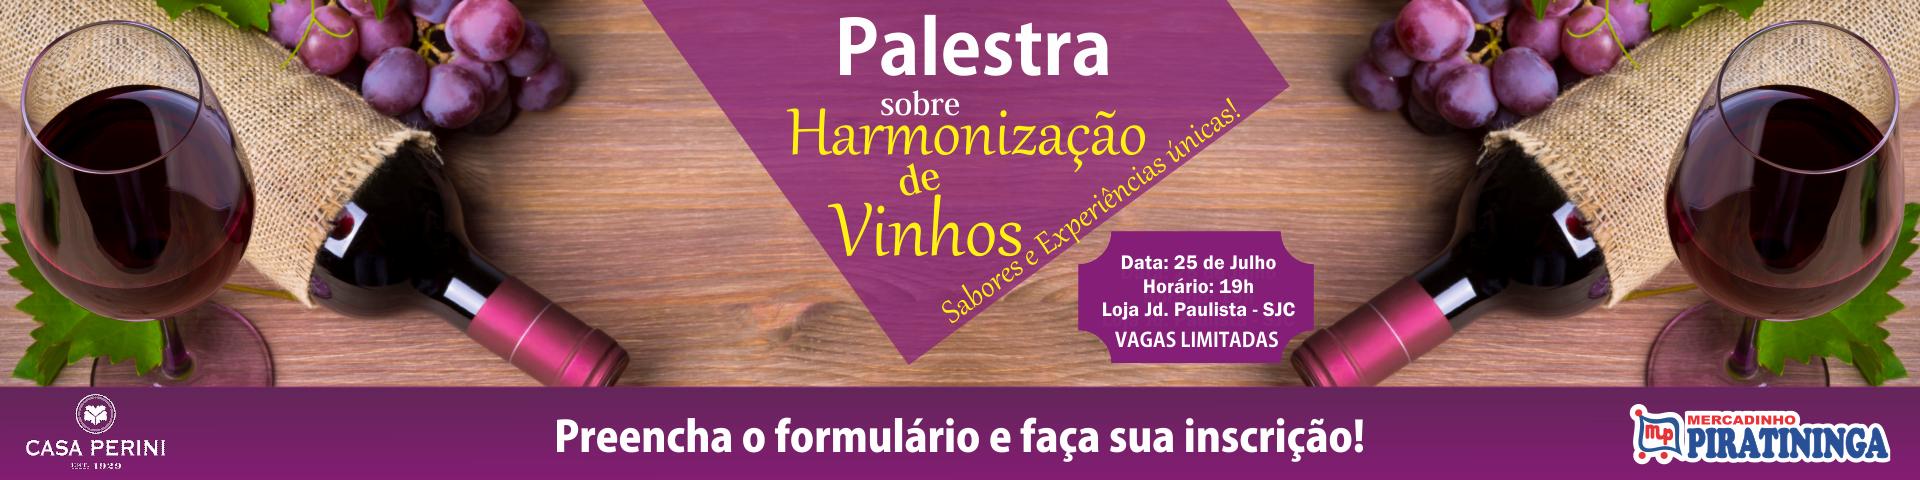 PALESTRA SOBRE VINHOS CASA PERINI - SJC!